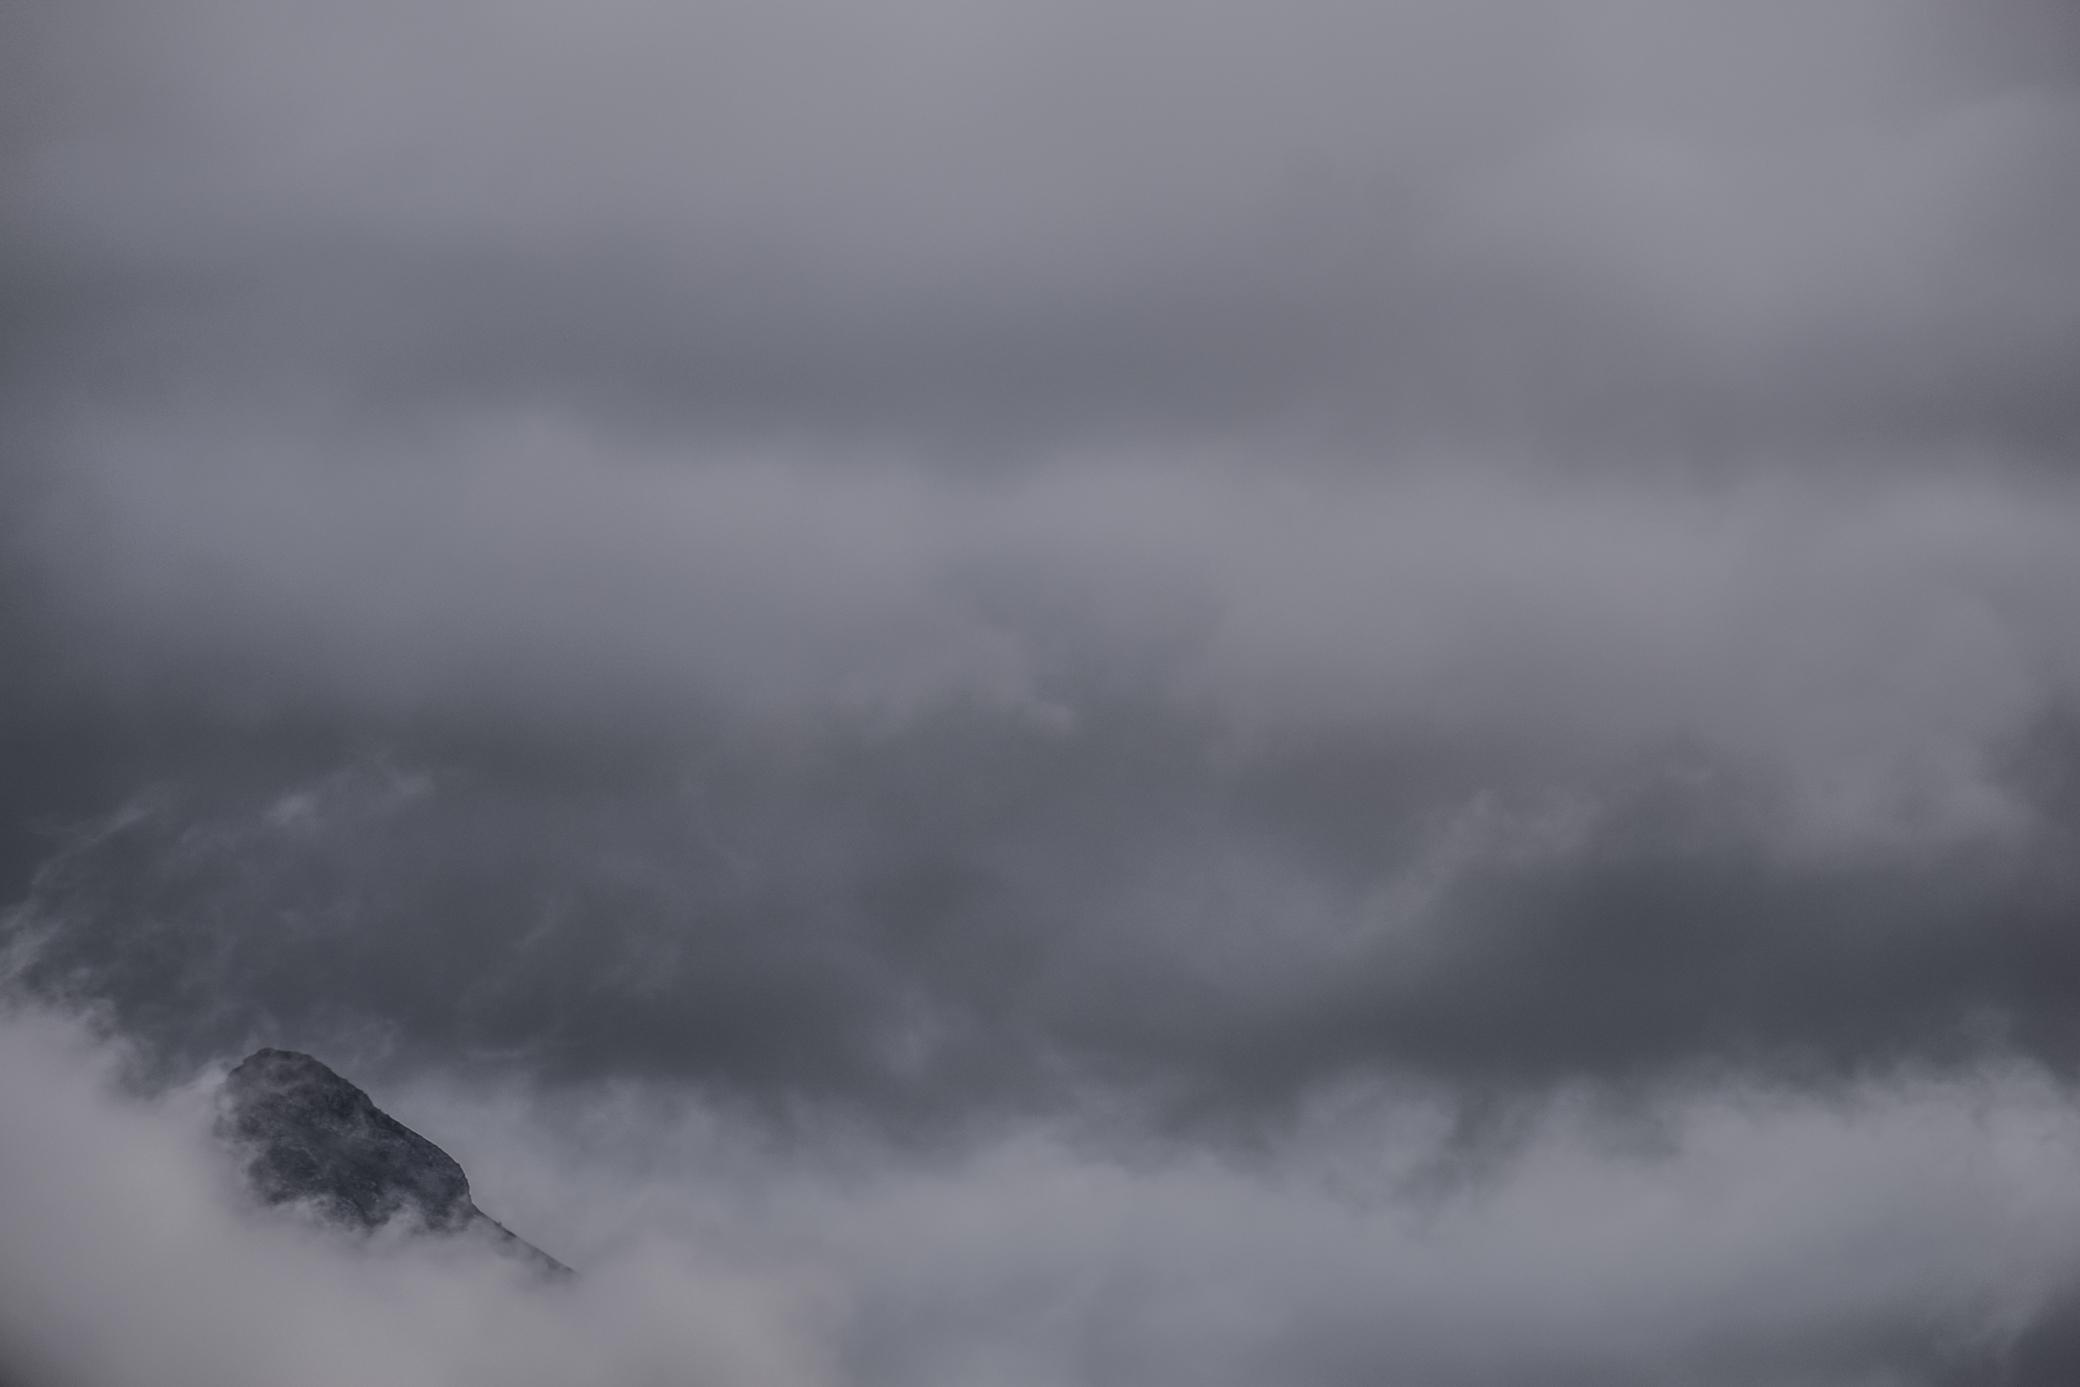 spainish_peak-1.jpg